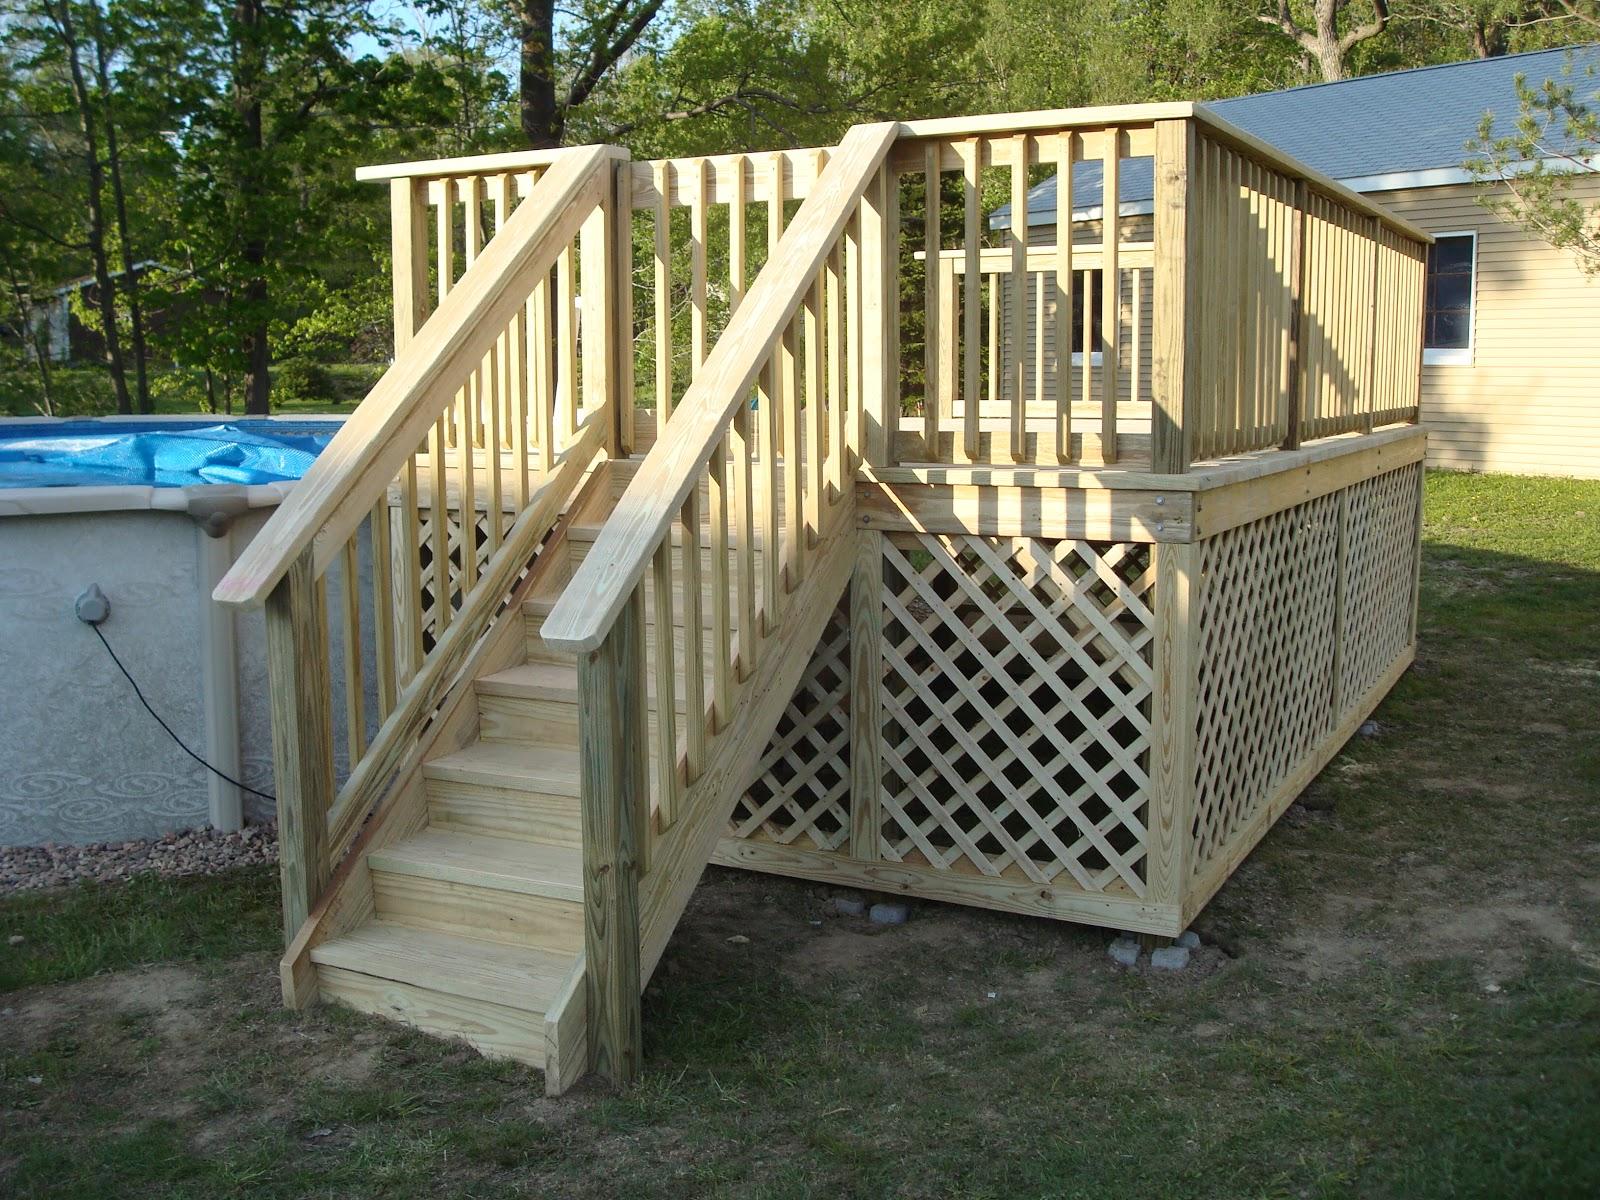 Curry custom decks for Above ground pool decks with lattice